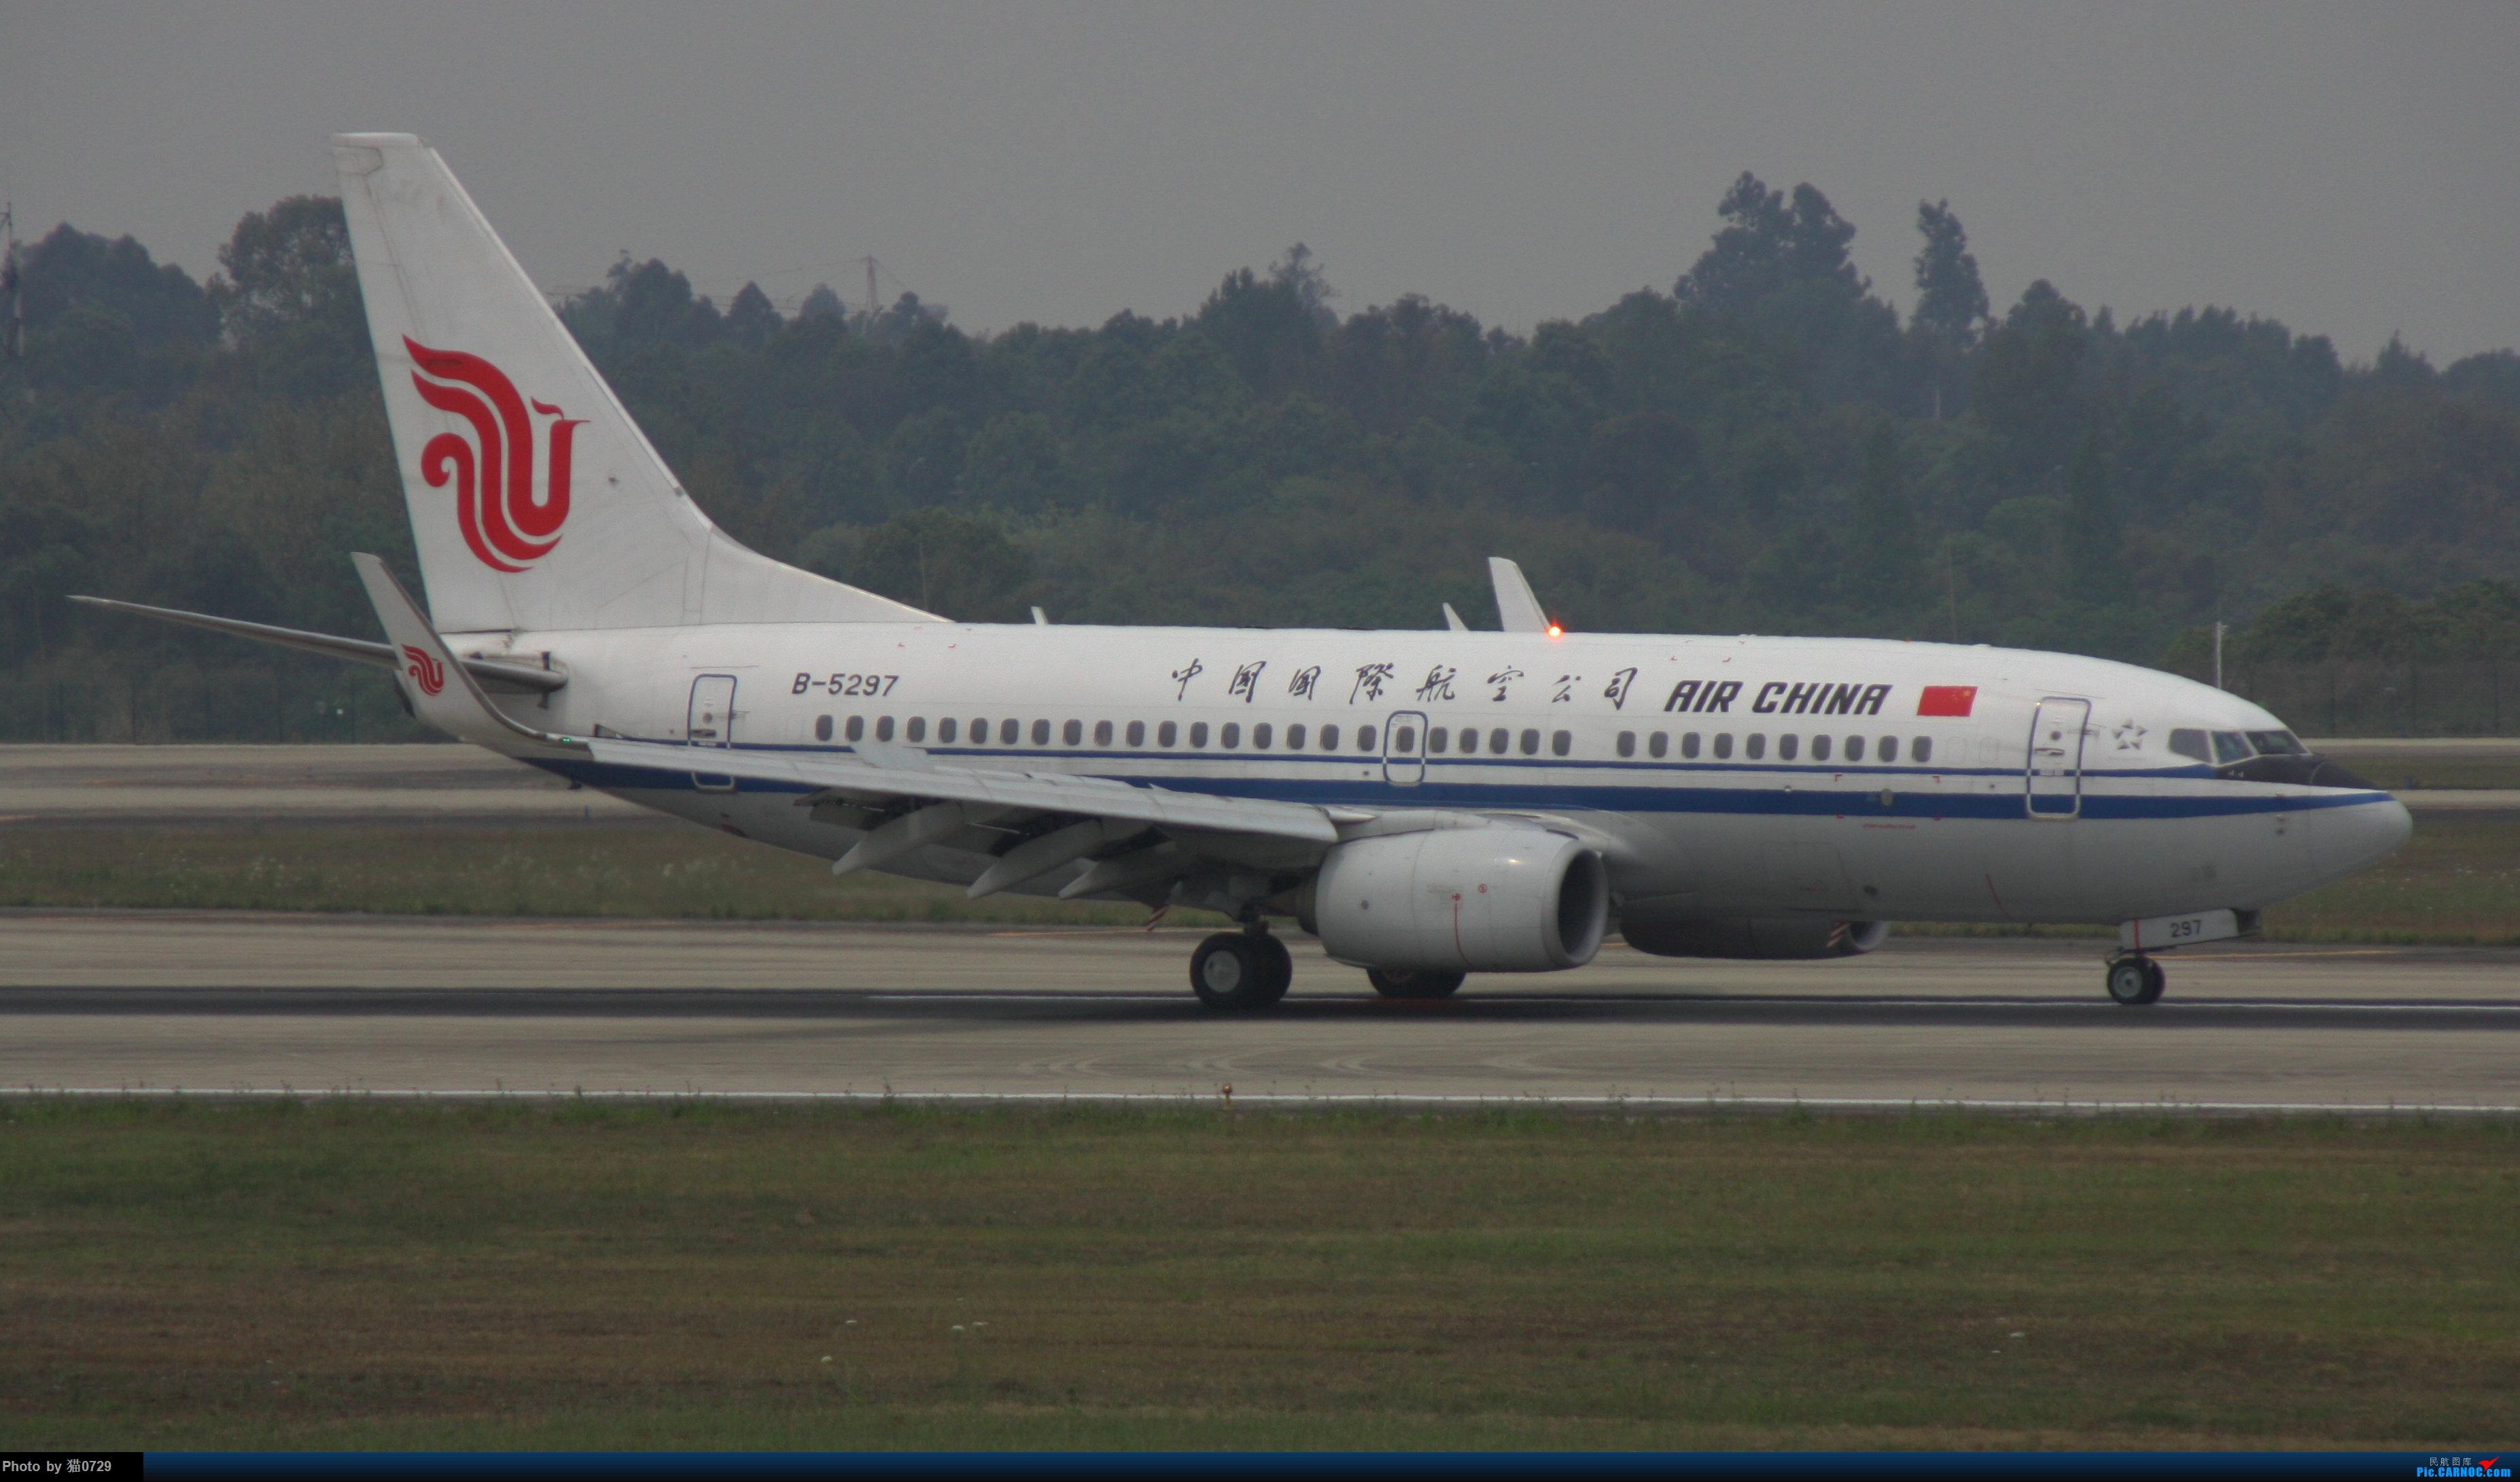 Re:[原创]CTU 119.425 水泥 伊朗346 巴基斯坦777 BOEING 737-700 B-5297 中国成都双流国际机场